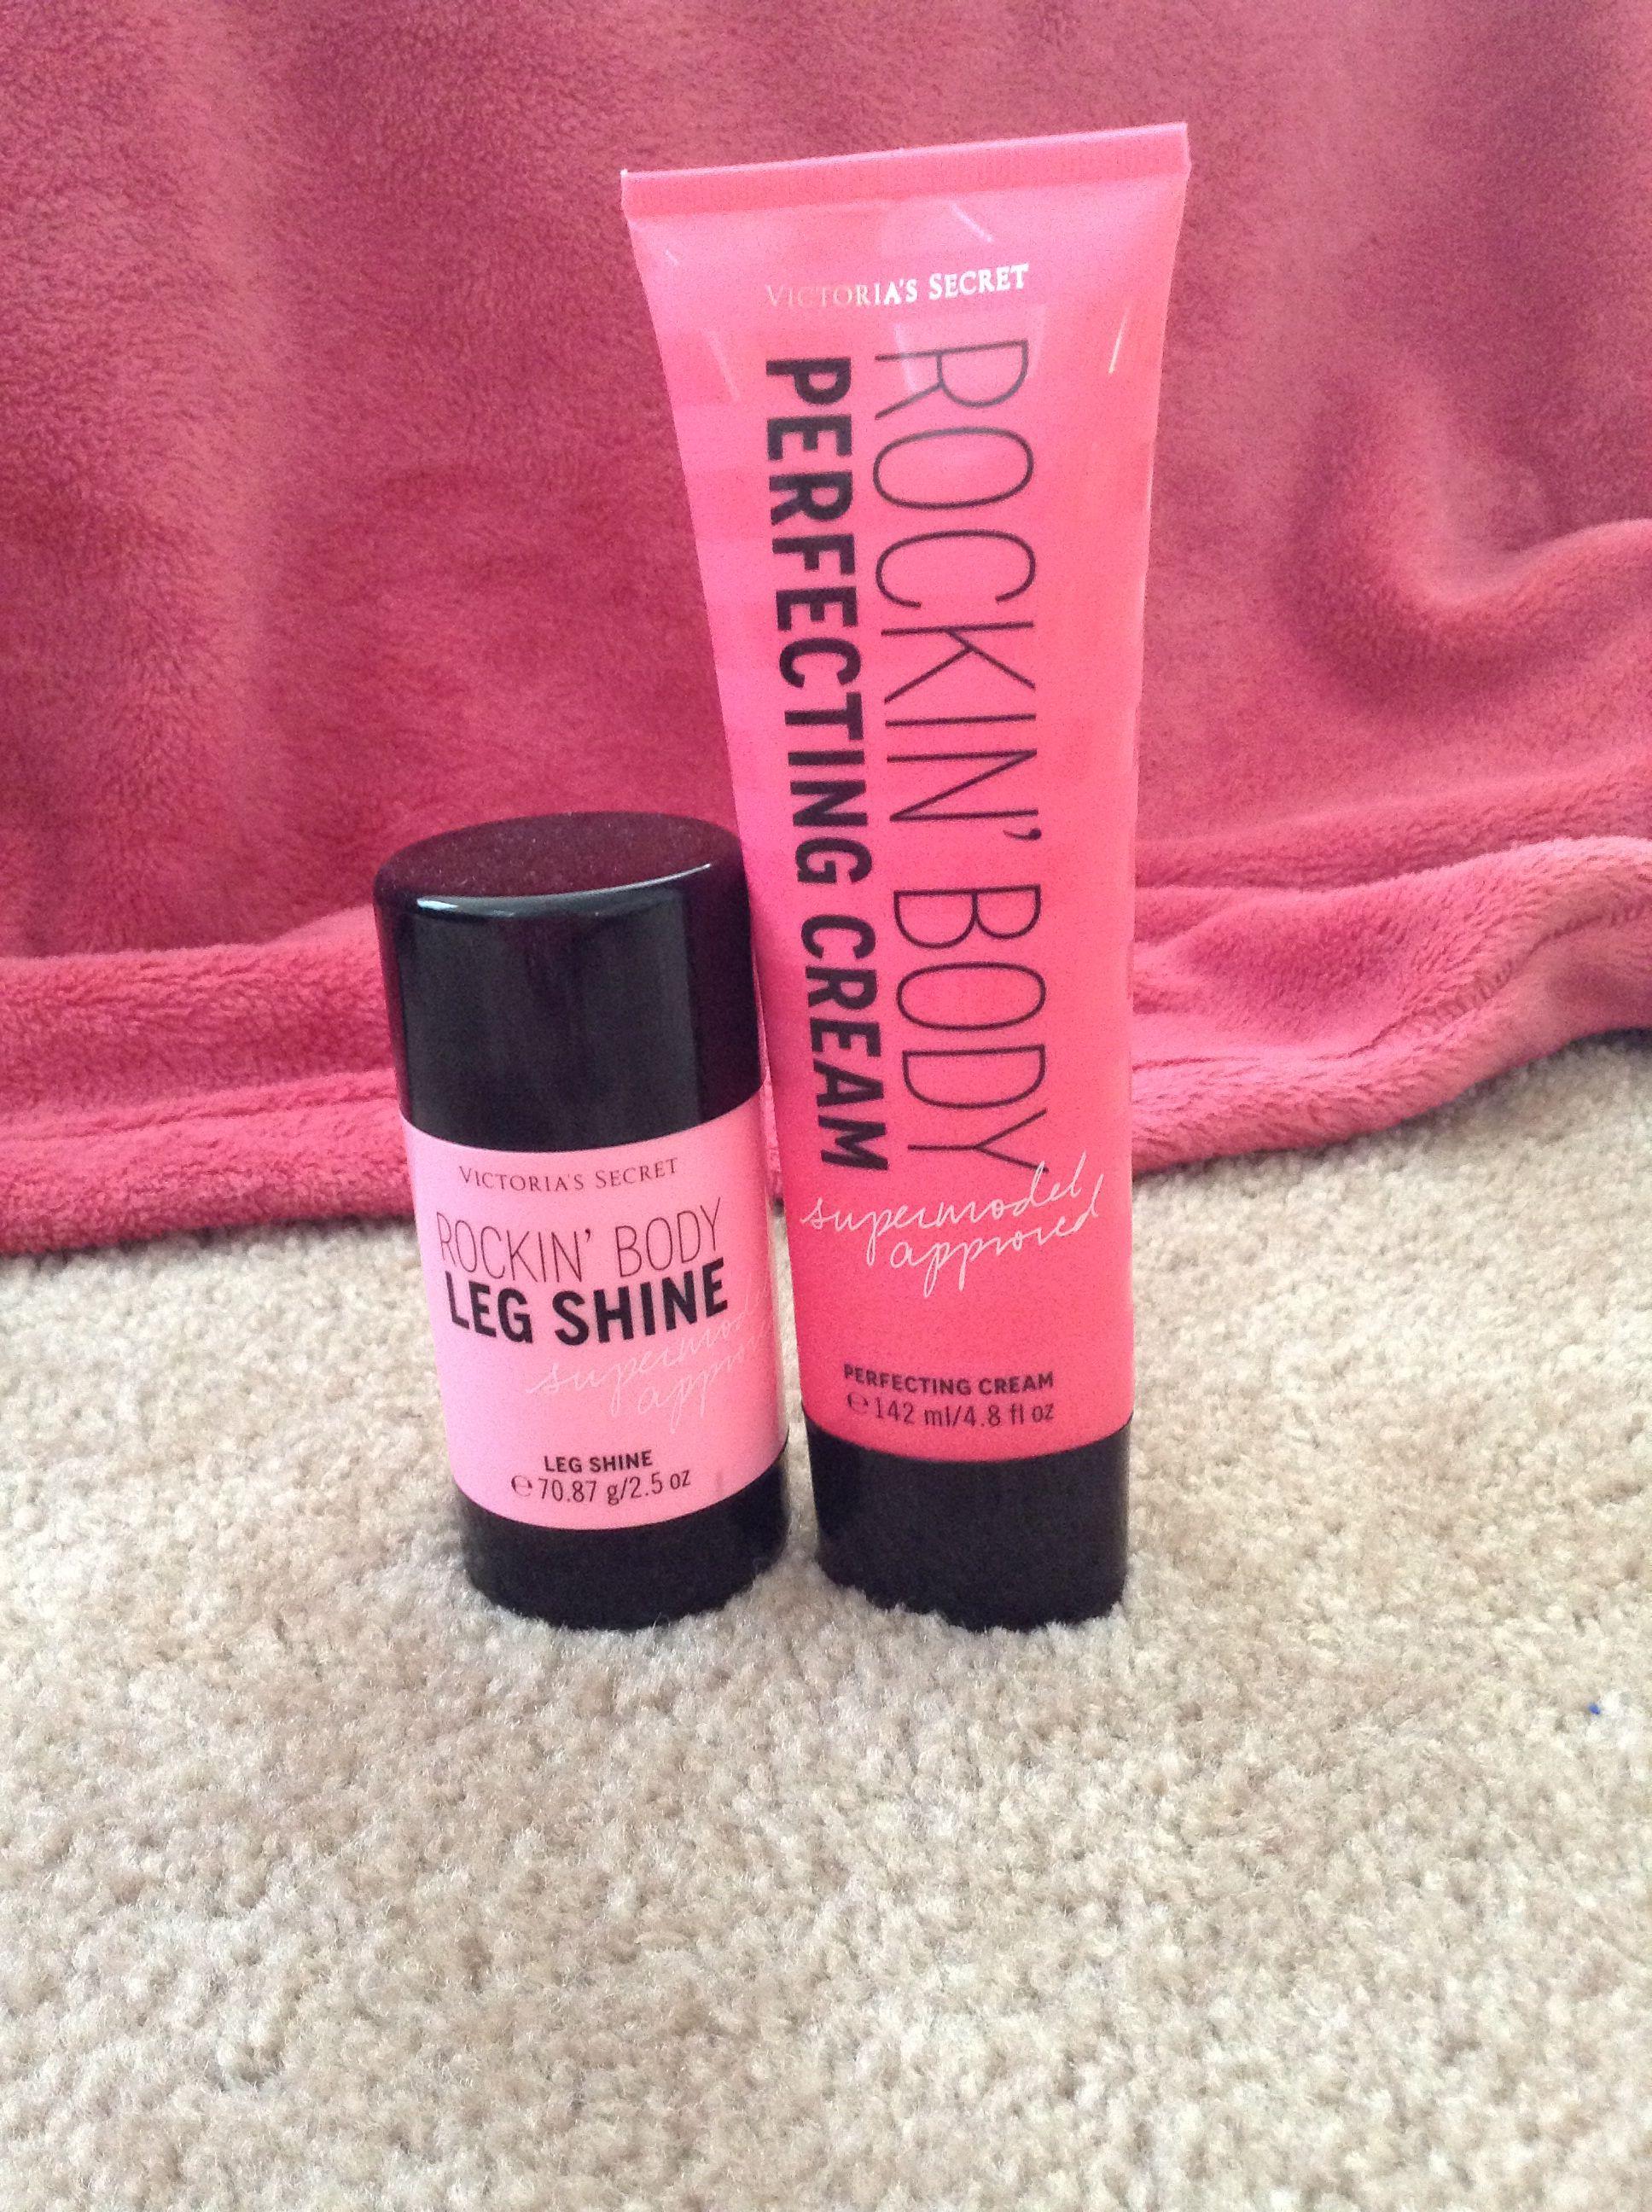 9ac10e0e071 Victoria s Secret Rockin  Body Perfecting Cream and Leg Shine. For FLAWLESS  legs. This stuff is AMAZING!!!